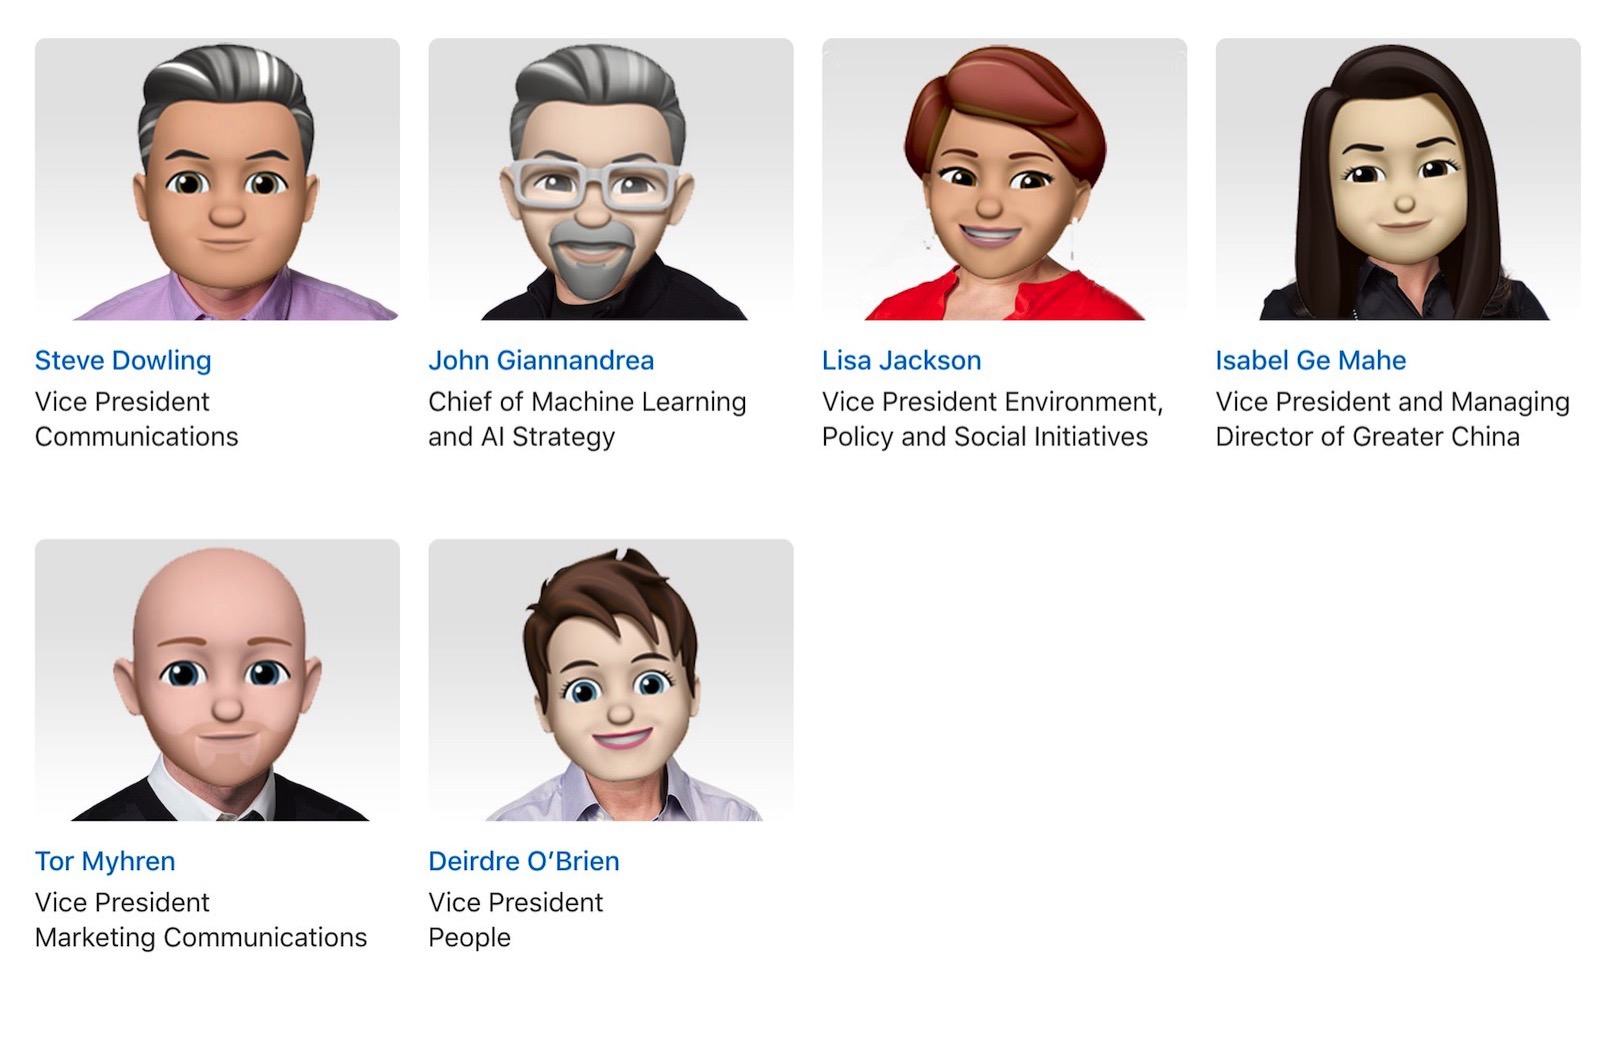 Executives Profiles in Emoji 3